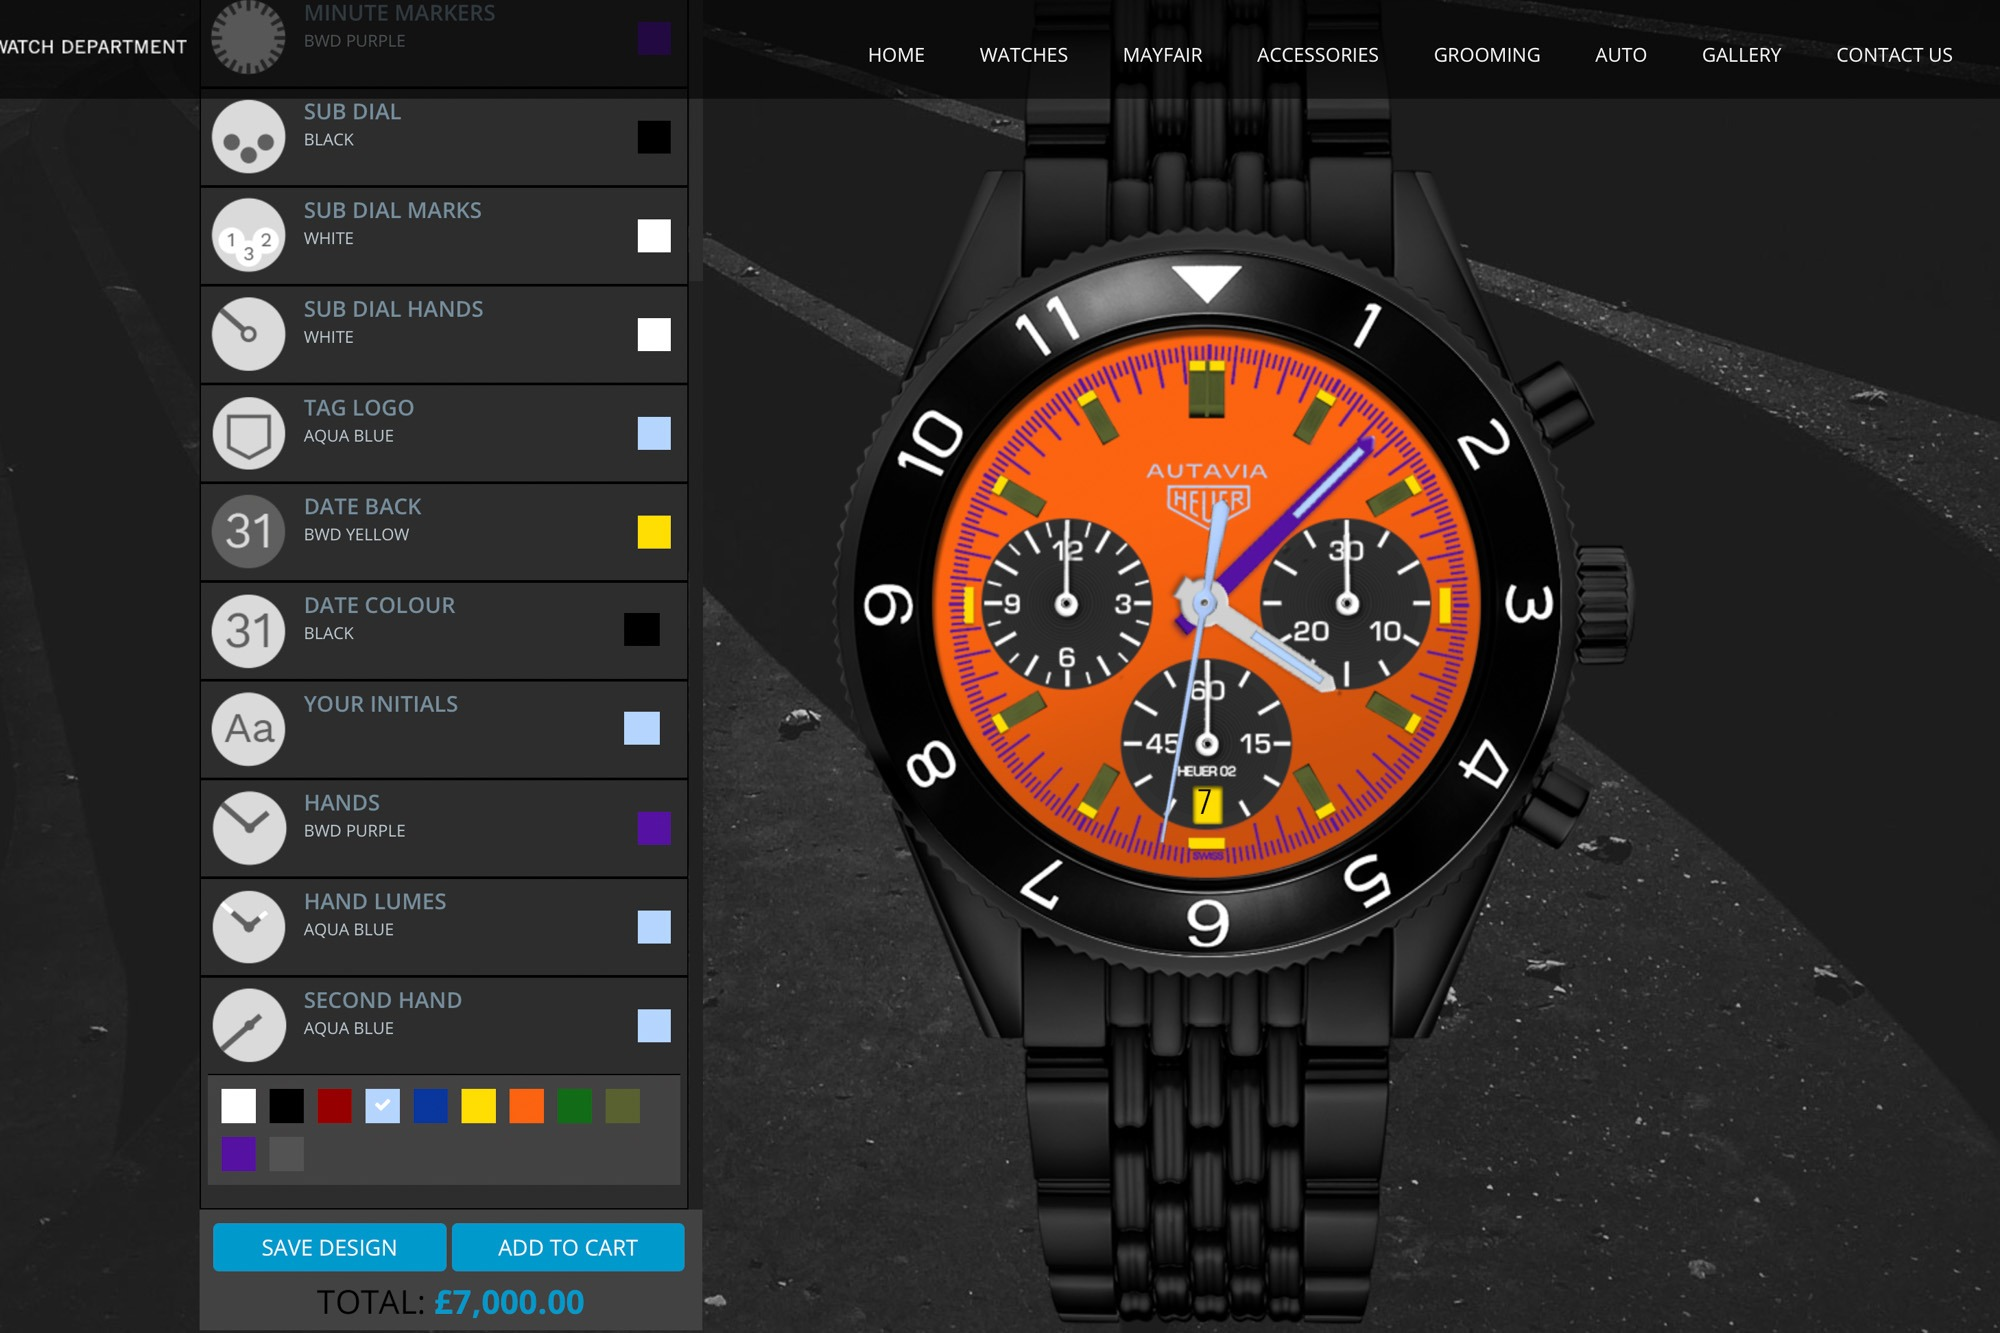 Tag Heuer Autavia - Bamford - Personnalisation de montres BWD